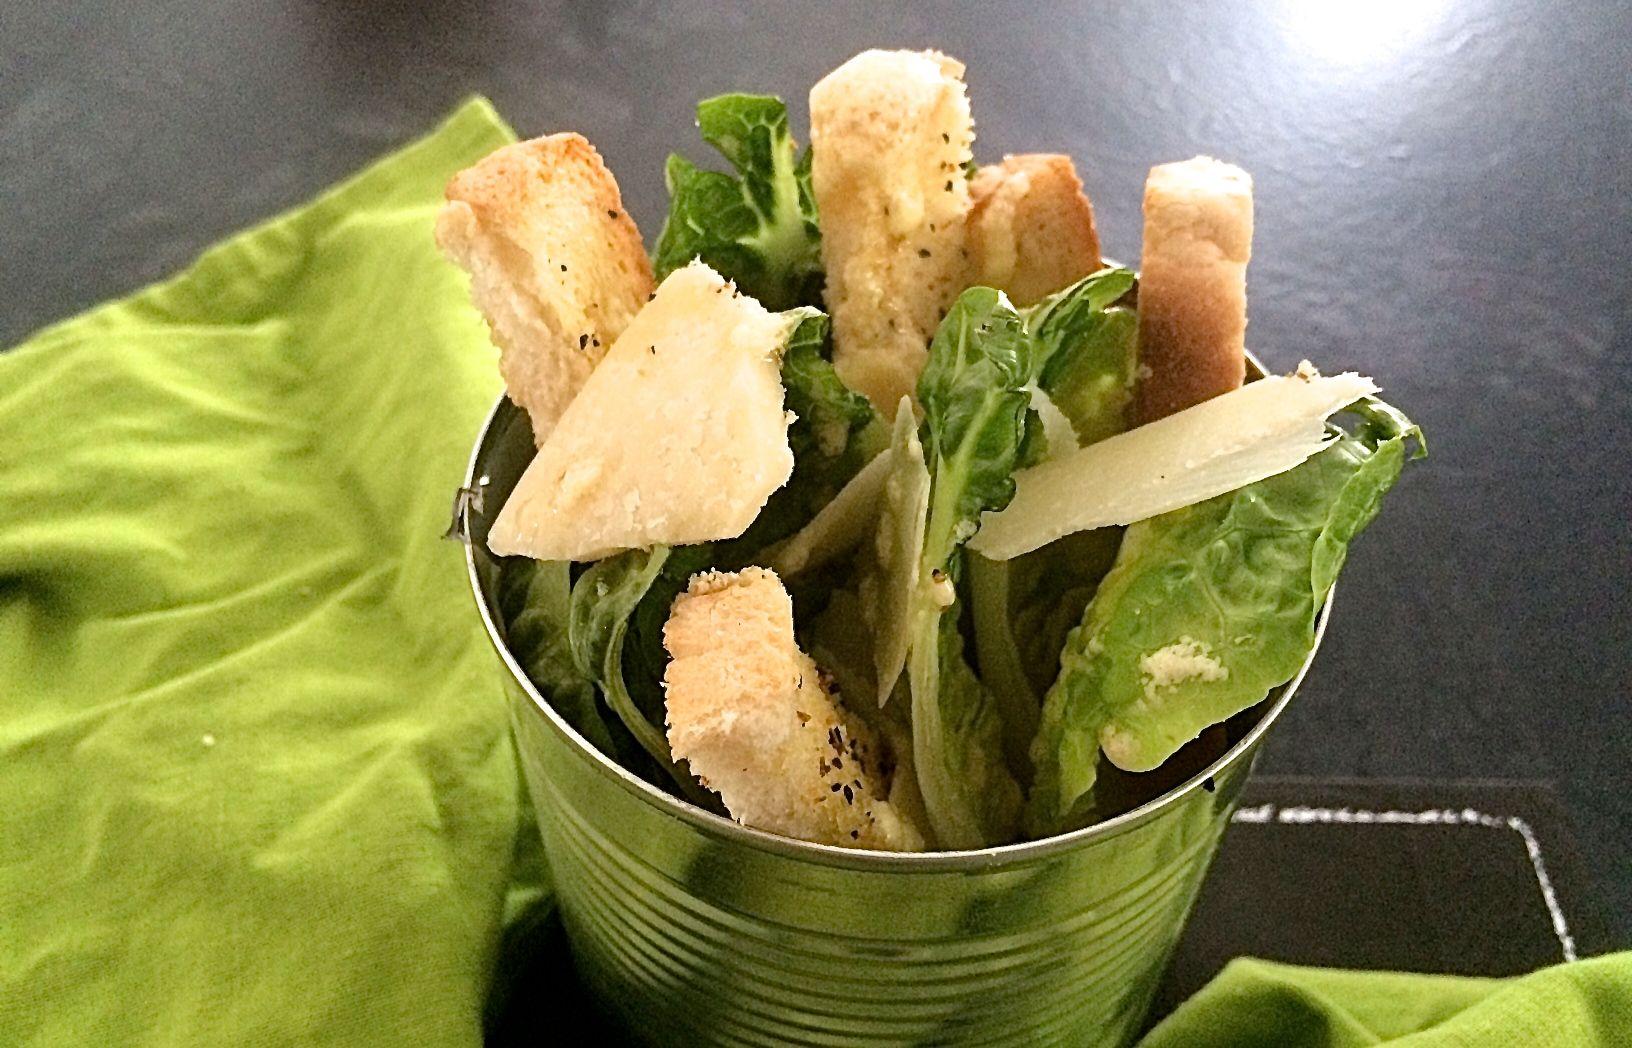 caesar salad nach us originalrezept. Black Bedroom Furniture Sets. Home Design Ideas